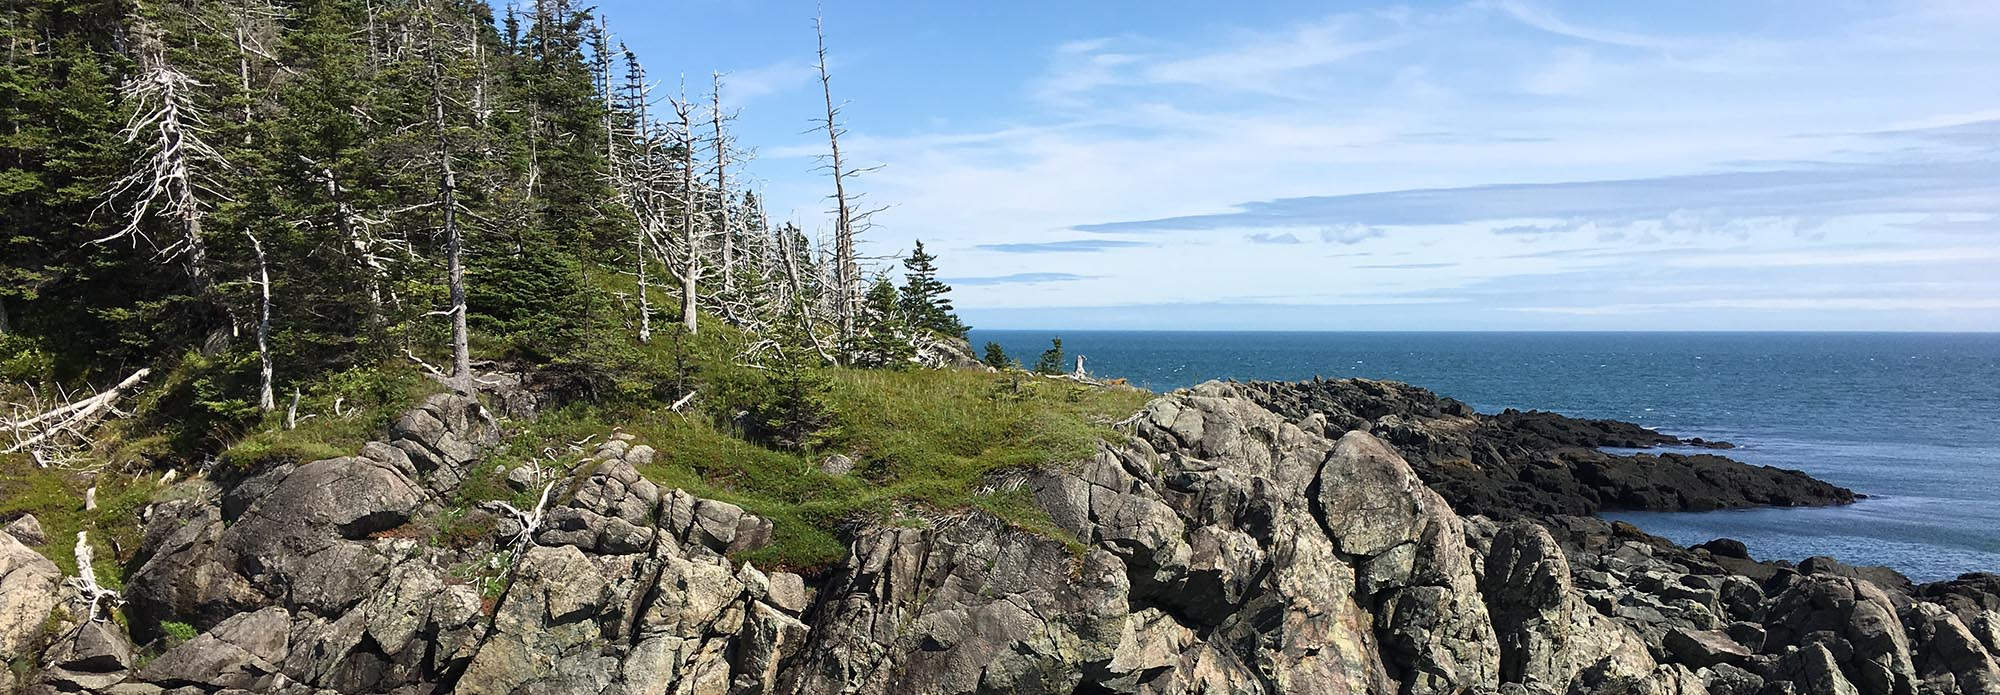 Veiw from Western Head Trail